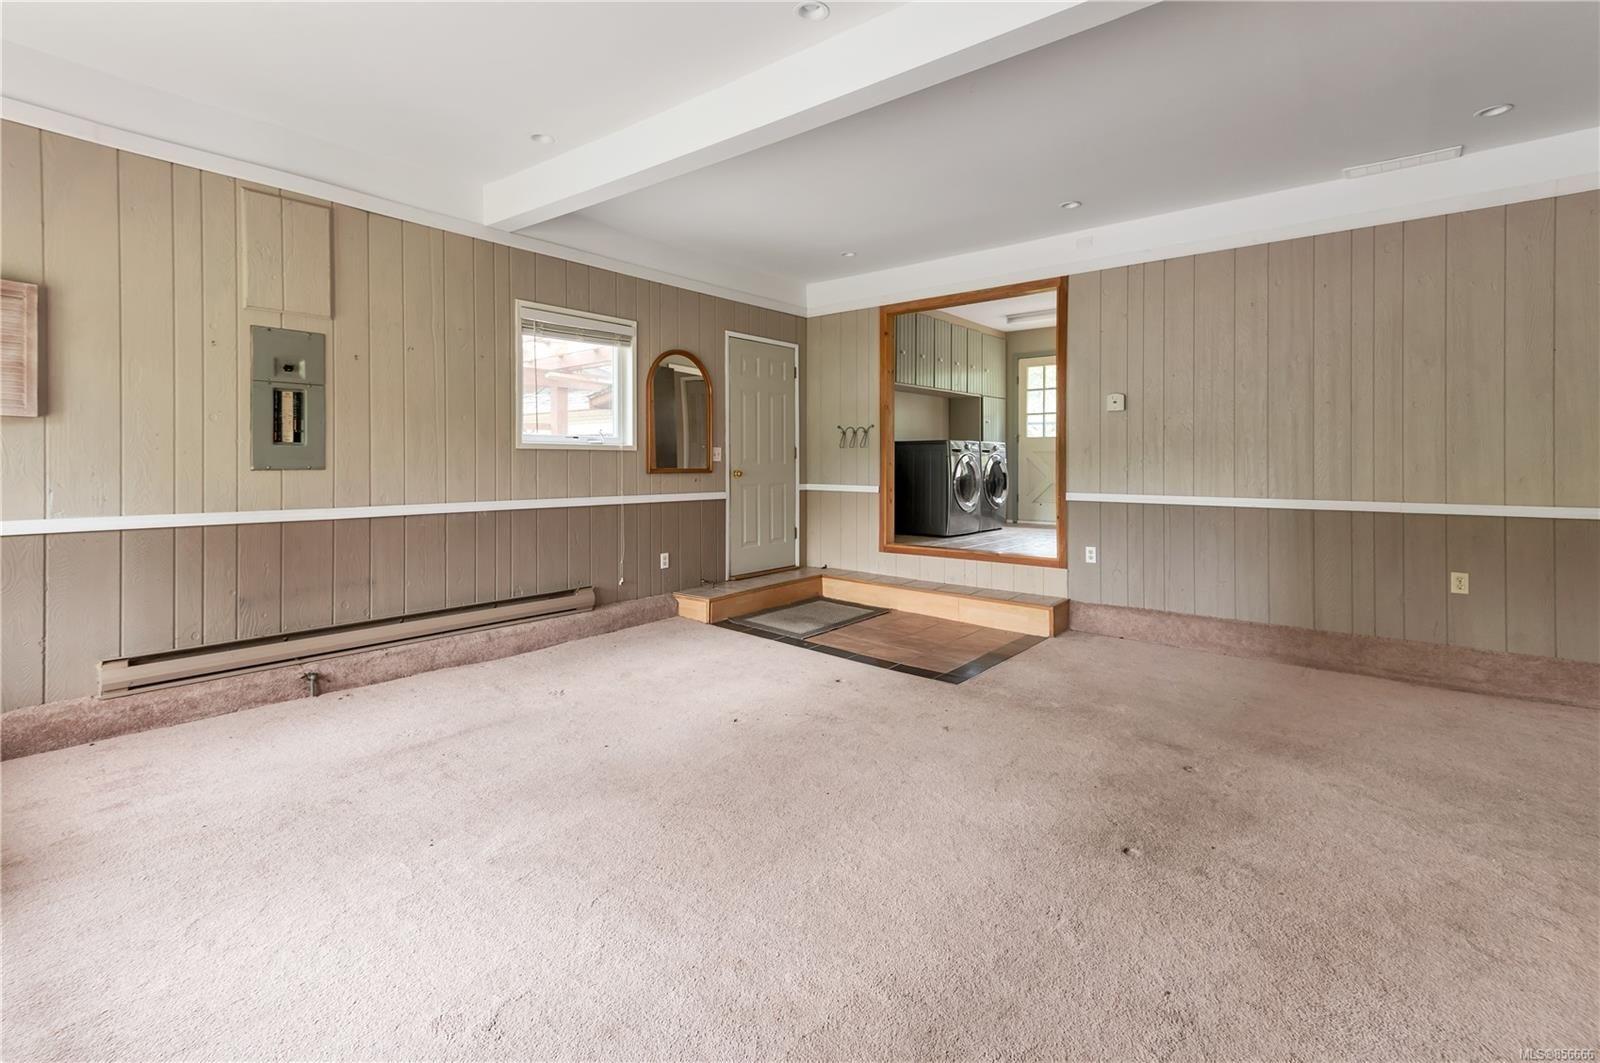 Photo 23: Photos: 2468 Oakes Rd in : CV Merville Black Creek House for sale (Comox Valley)  : MLS®# 856666